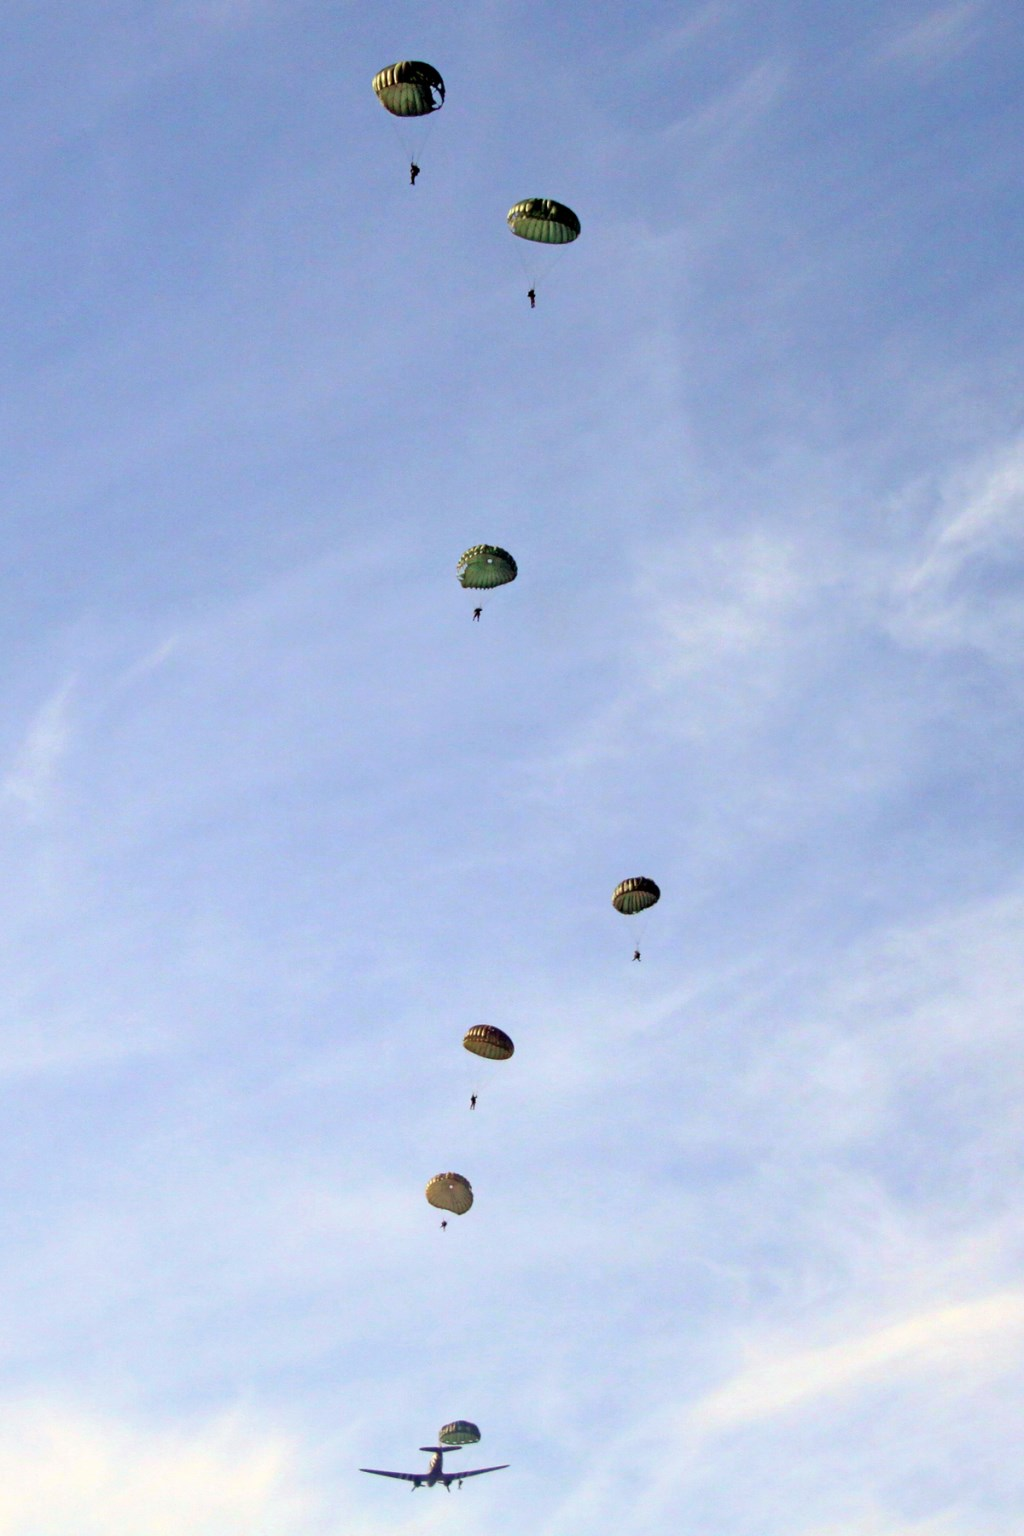 Foto: Lars Schwachöfer / Parachute Group Holland © DPG Media